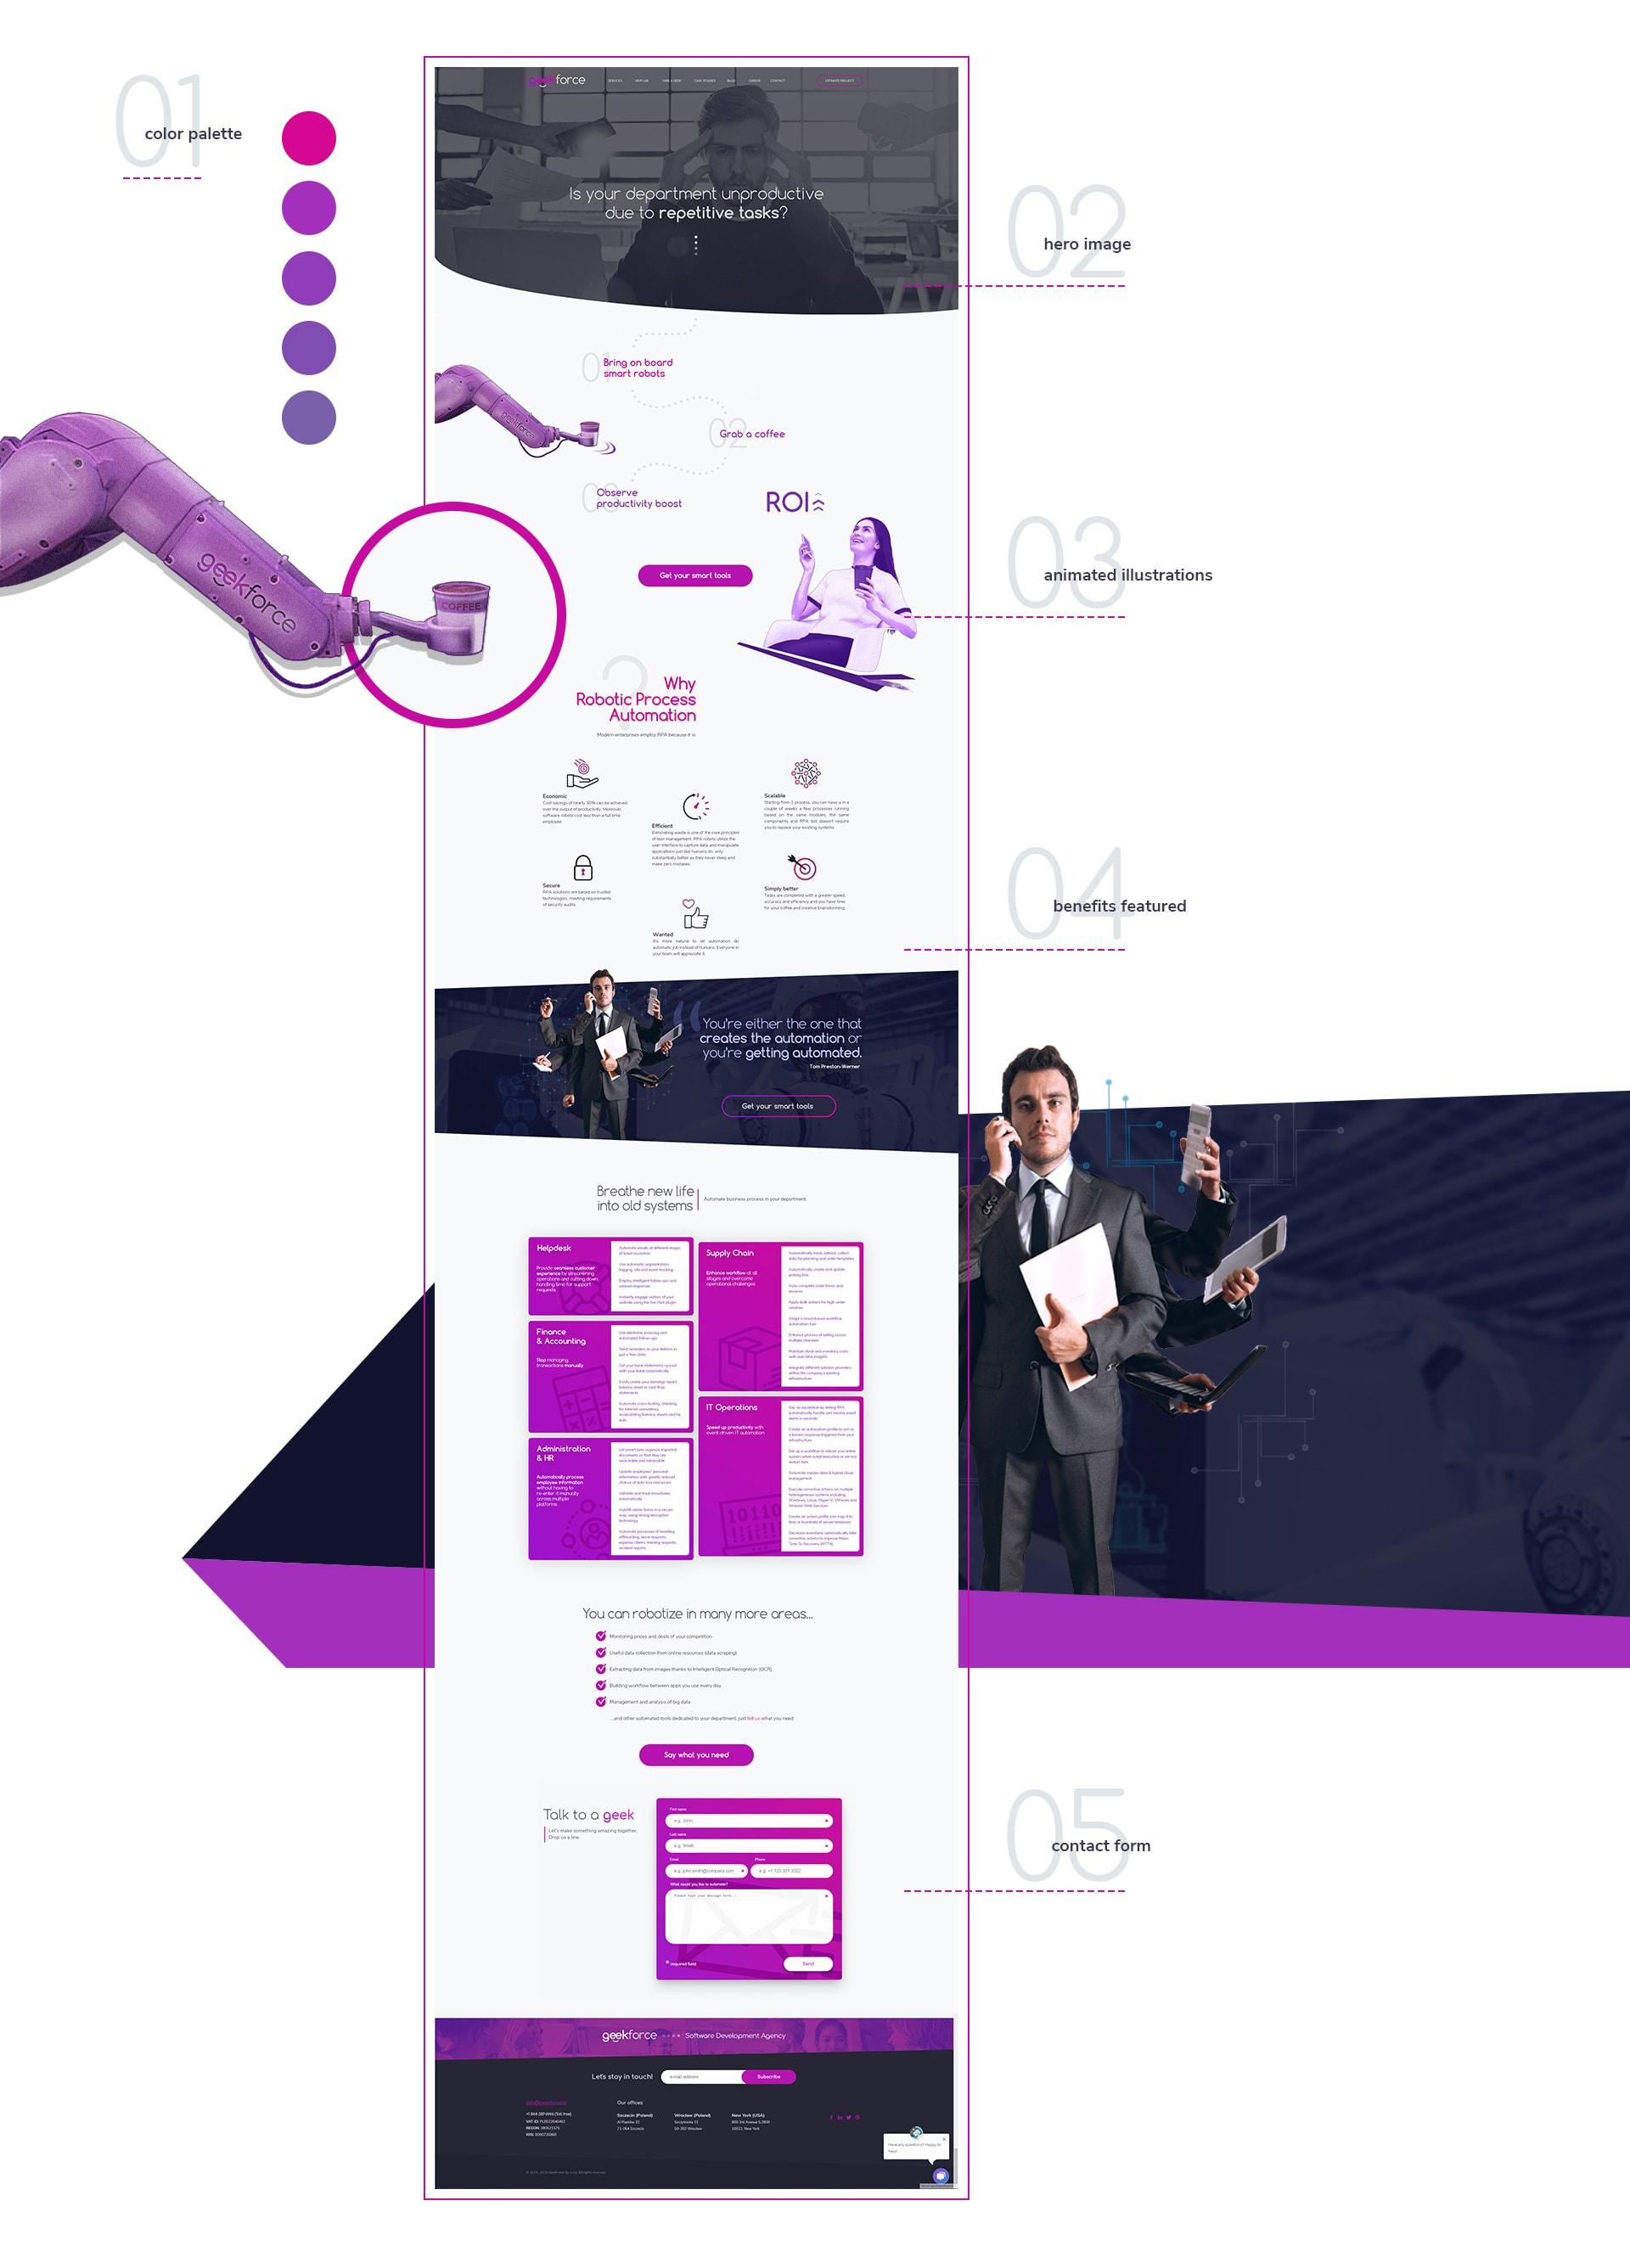 Geekforce Rpa Web Design